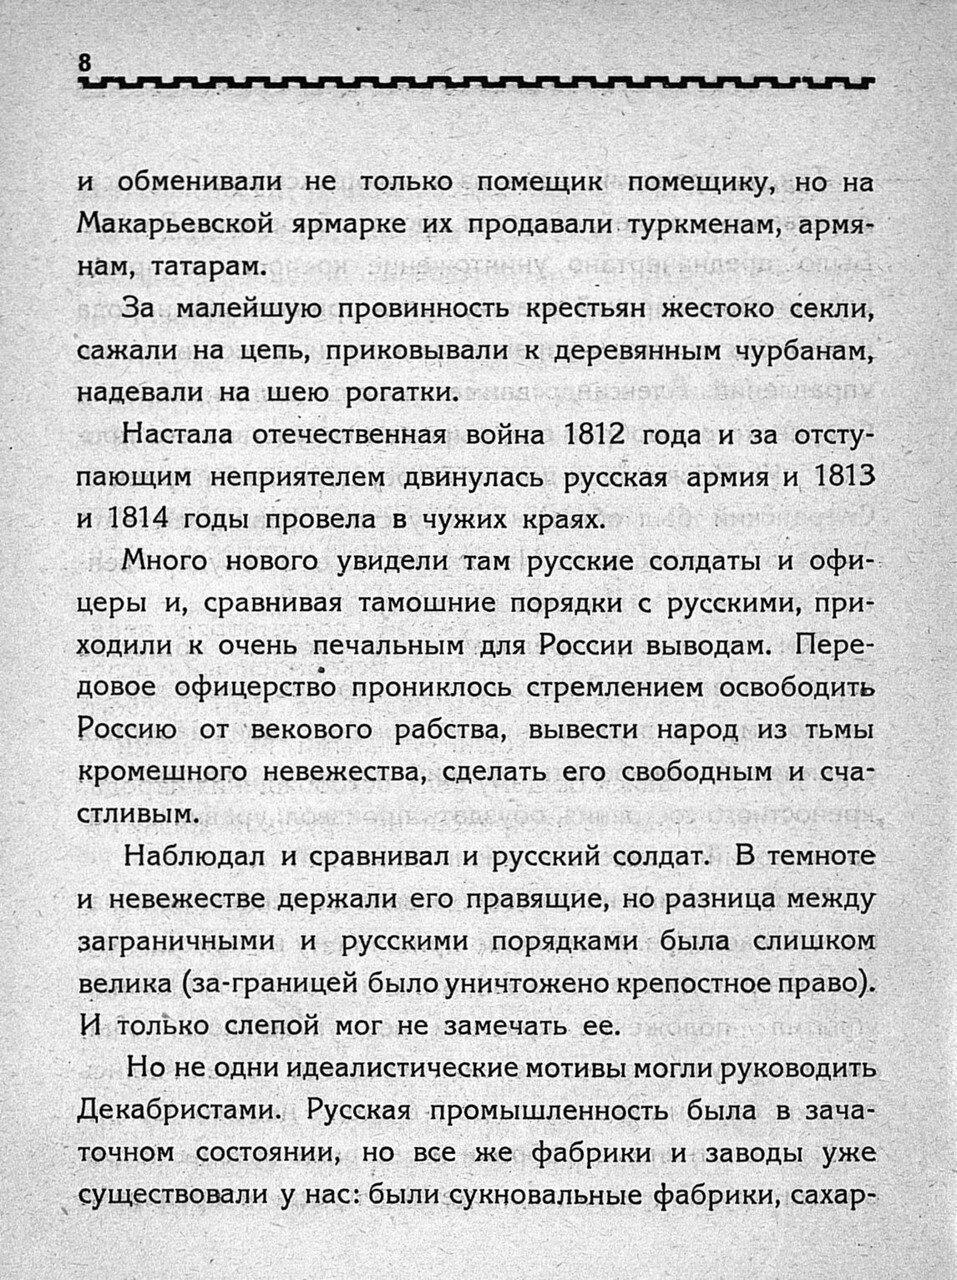 https://img-fotki.yandex.ru/get/38765/199368979.23/0_1bfacc_cb3b83e0_XXXL.jpg